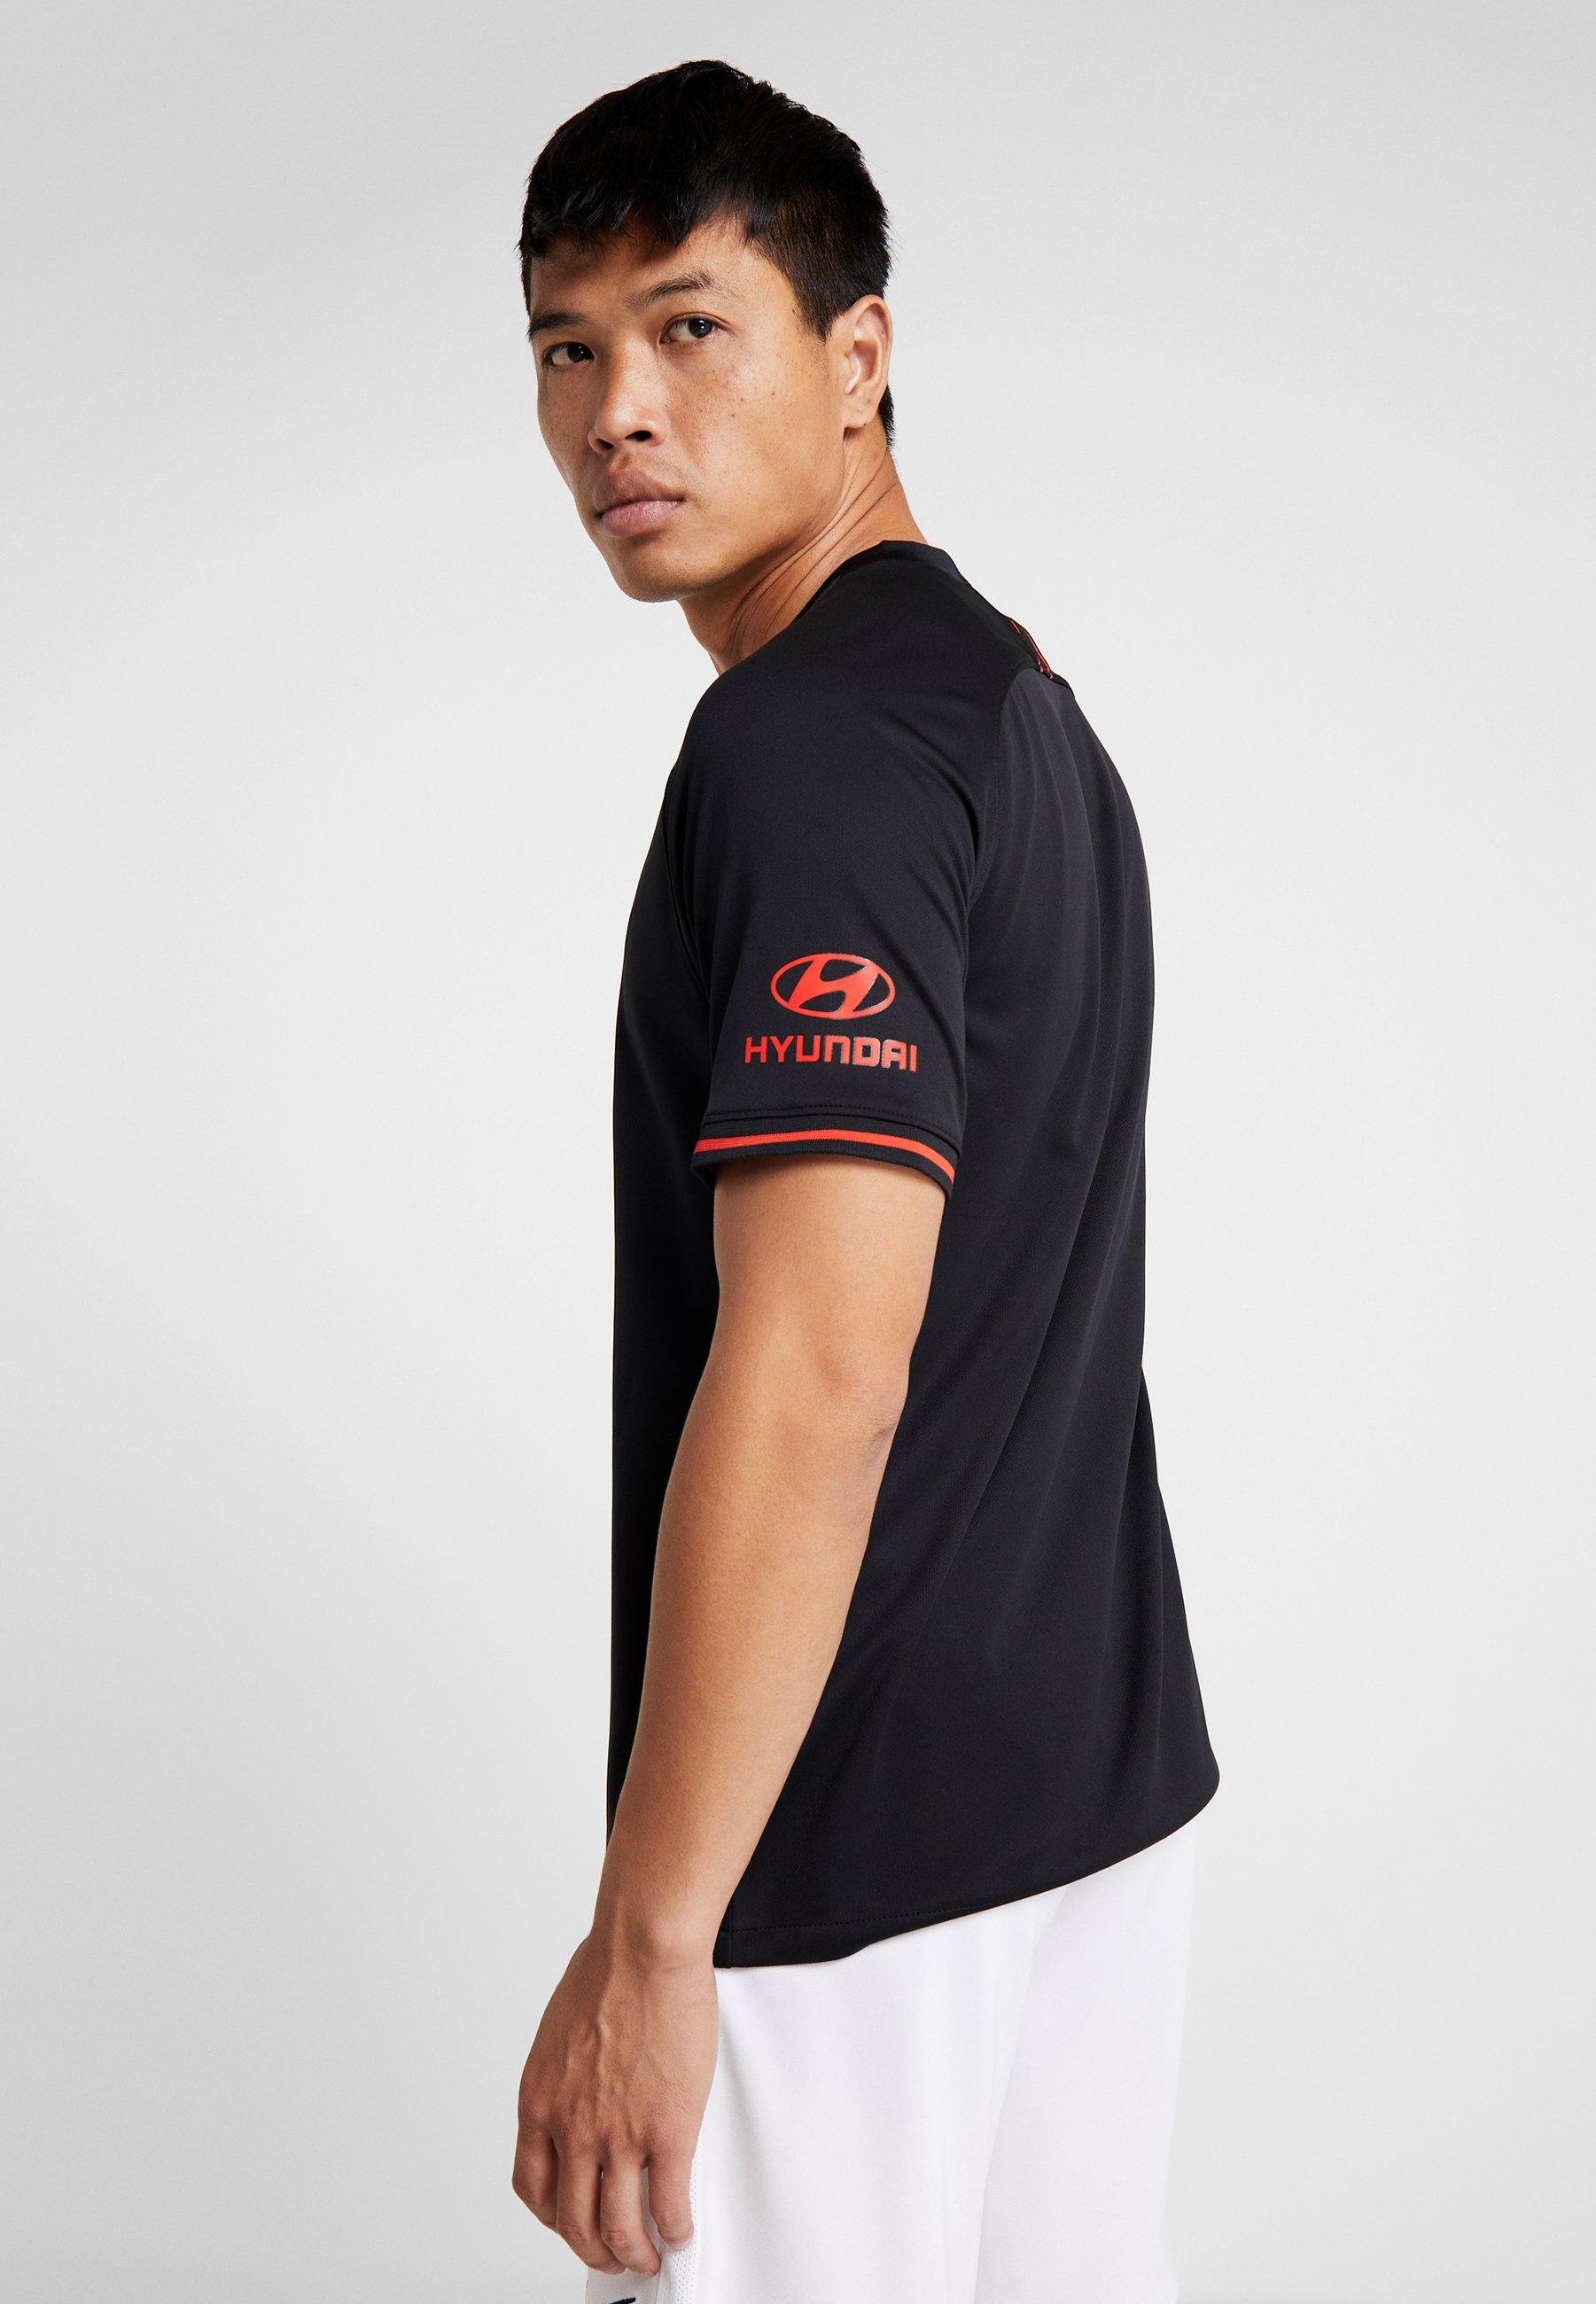 Performance MadridArticle Supporter Atletico Red Nike De Black challenge 8n0vmwyNO